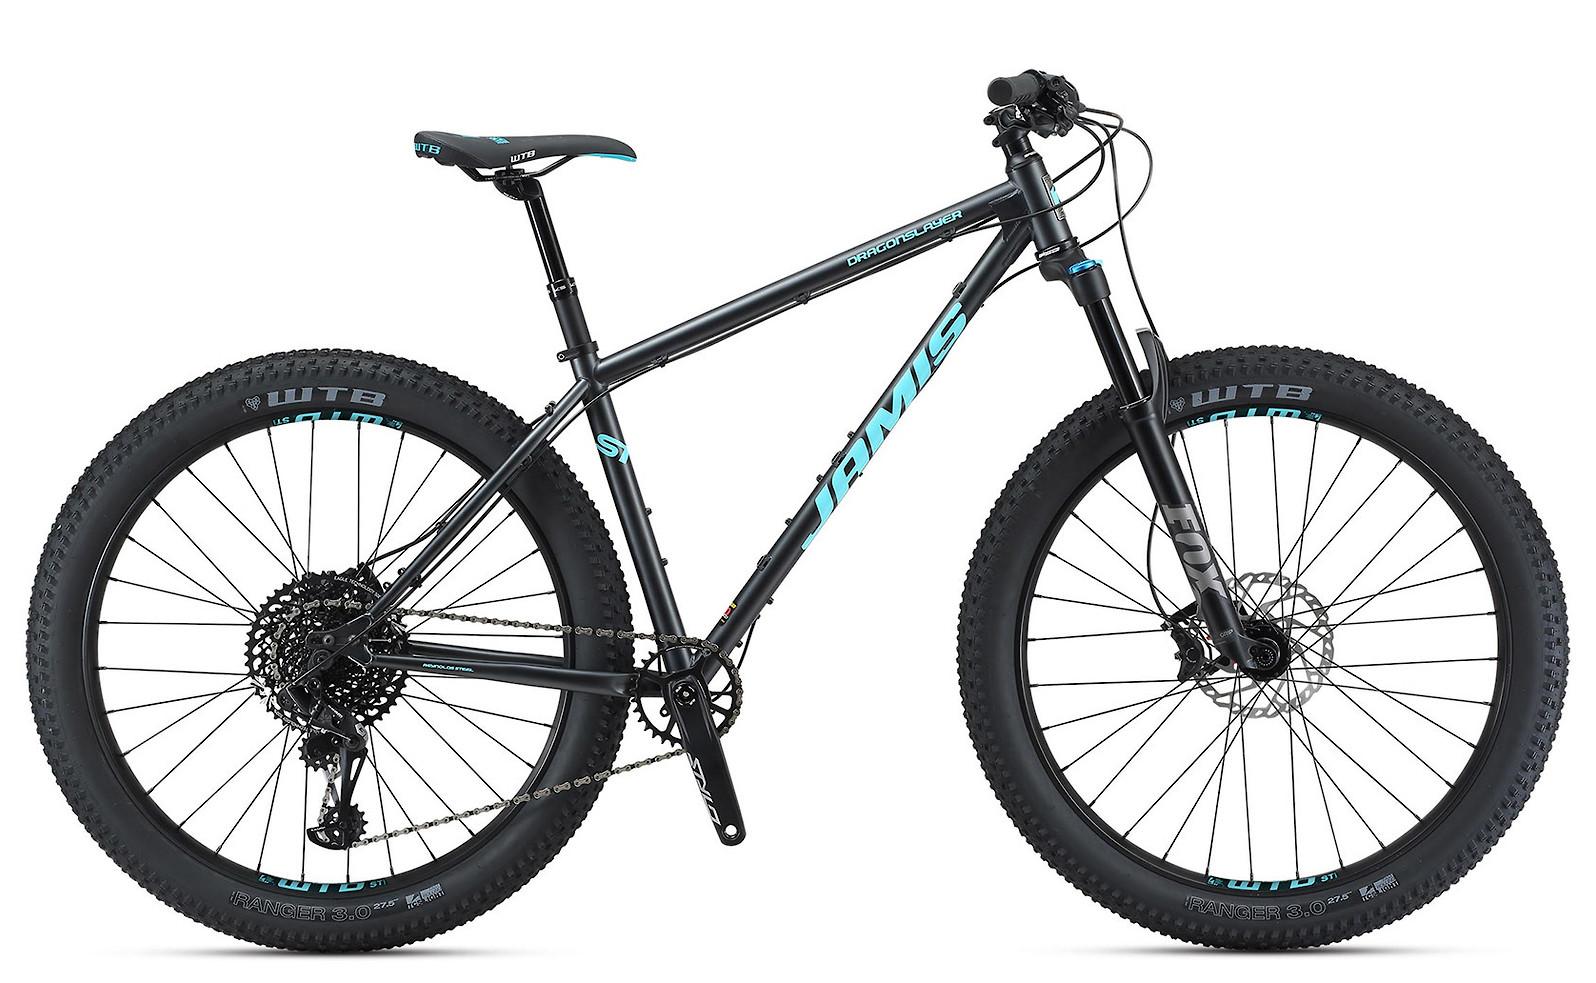 2019 Jamis Dragonslayer S1 27.5+ Bike